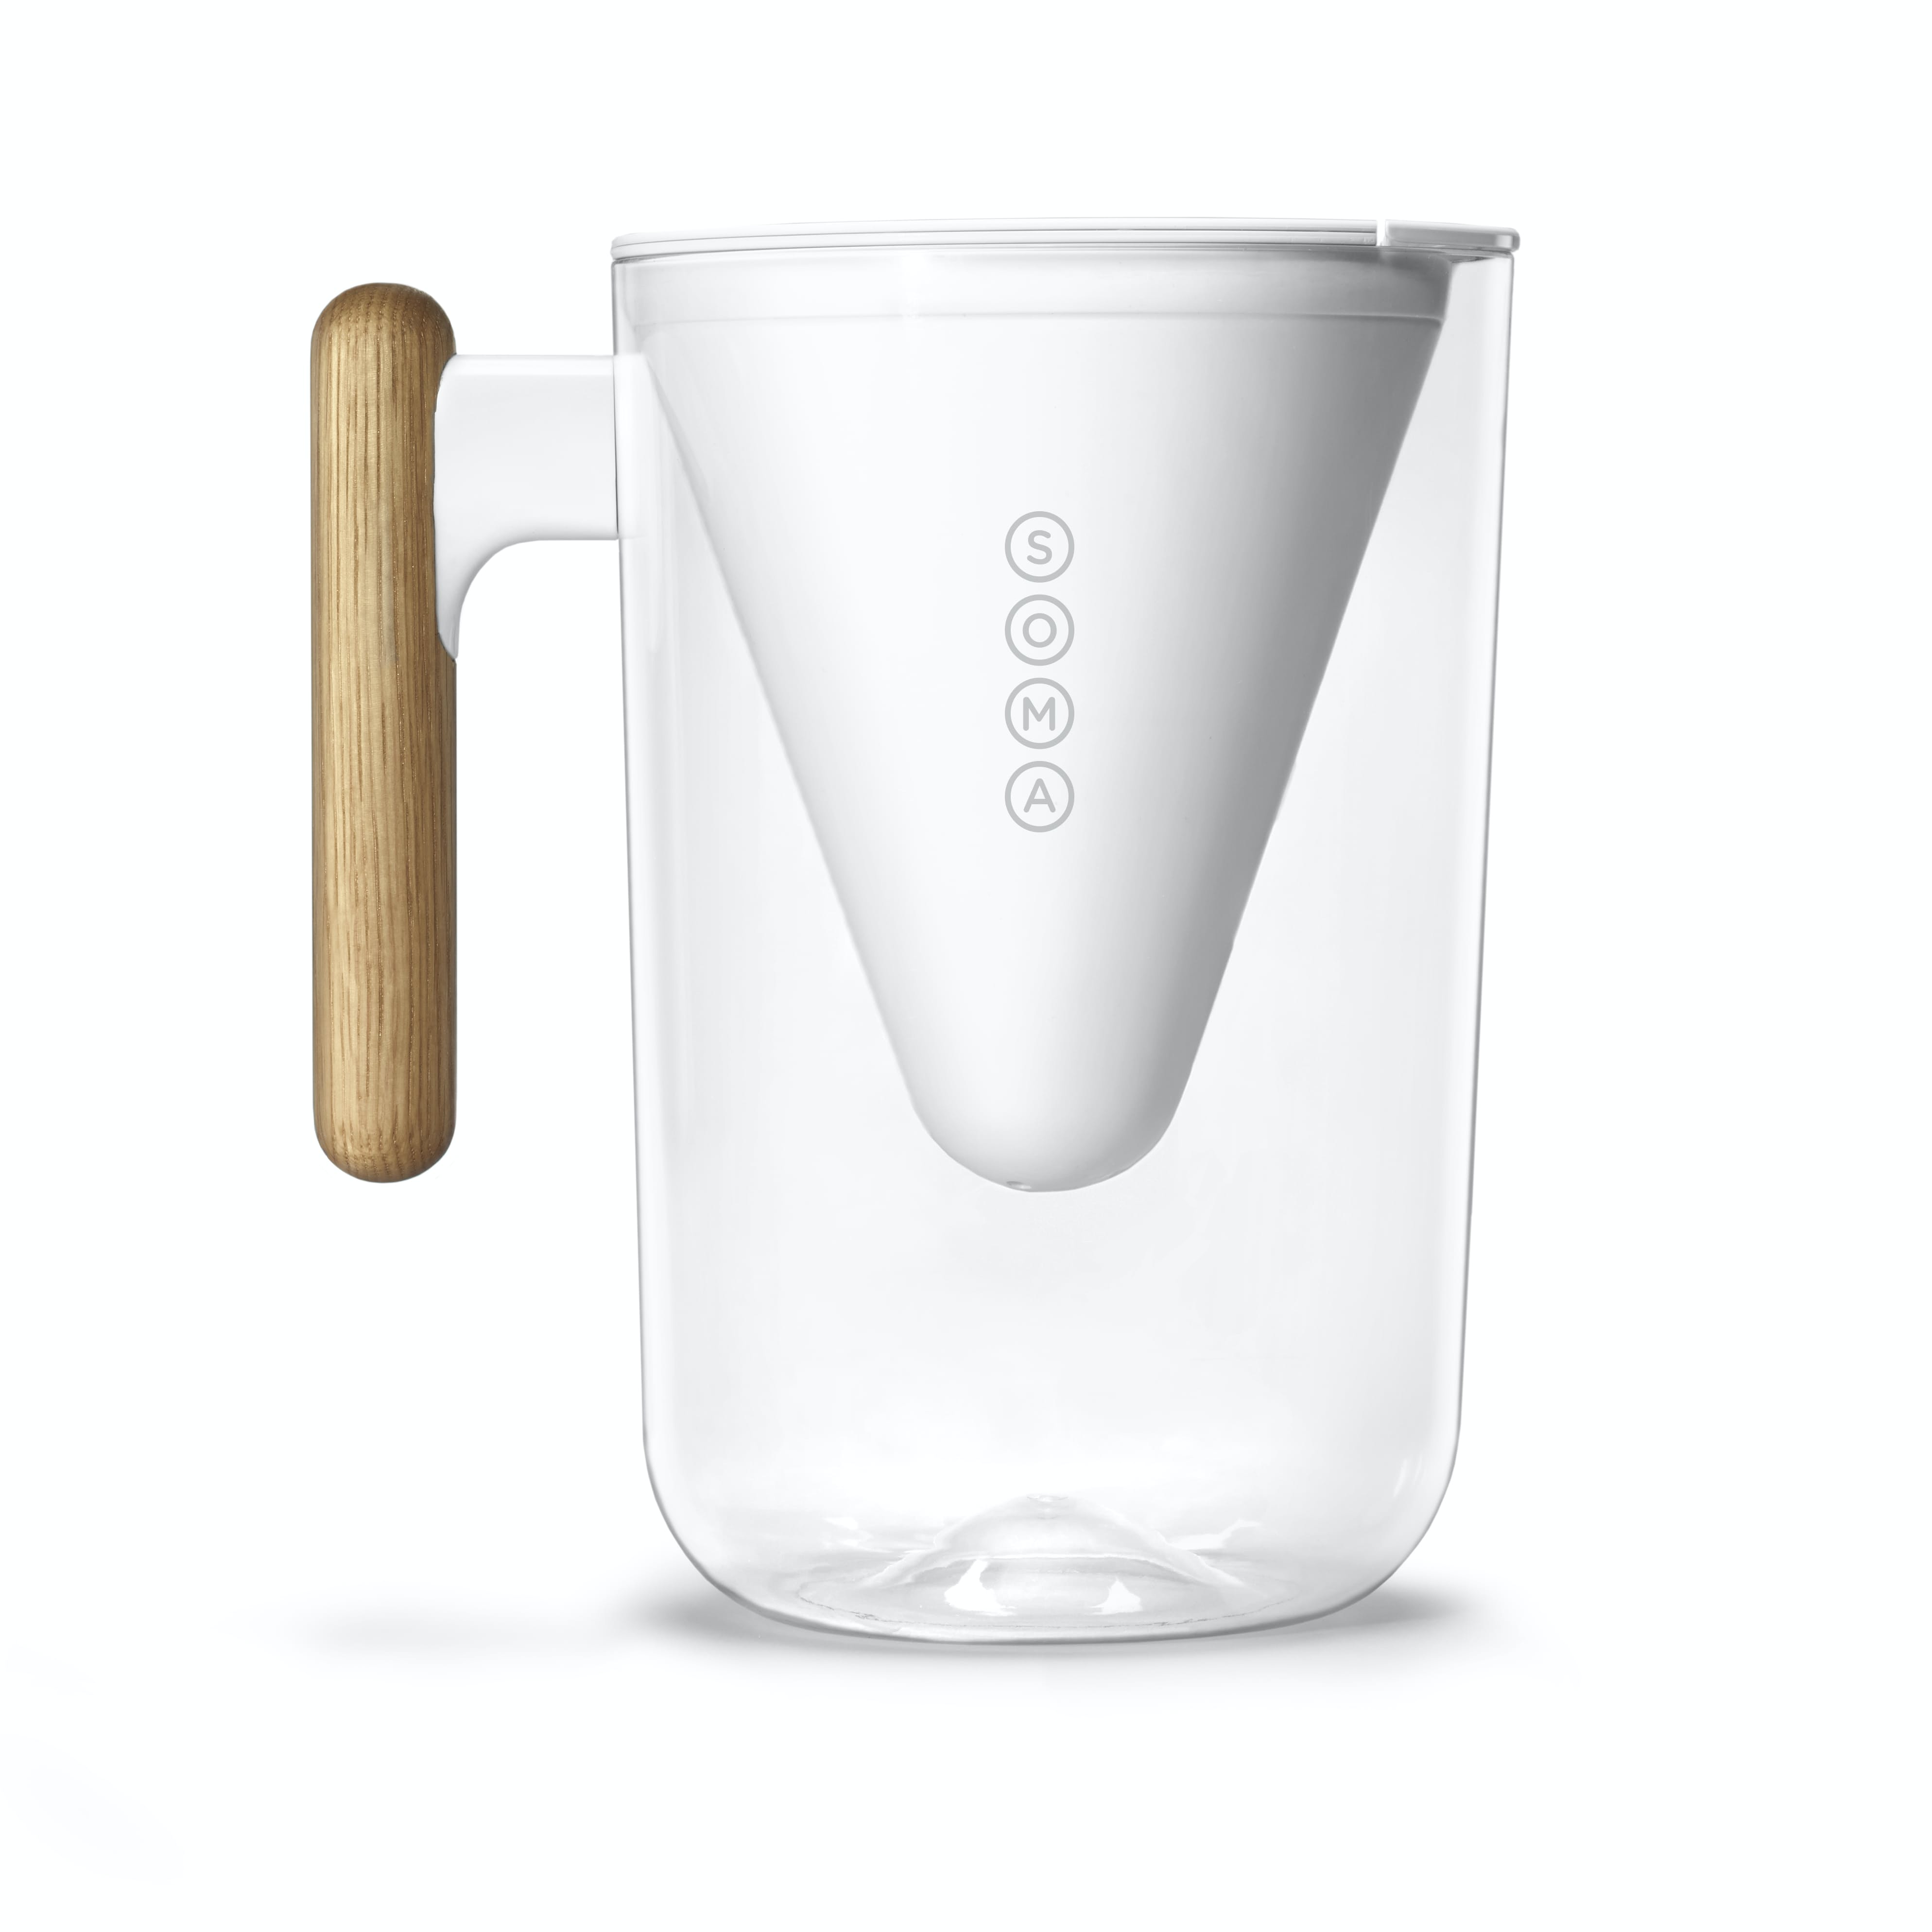 1nfxumcnlv soma 80 oz pitcher 4 filters 0 original